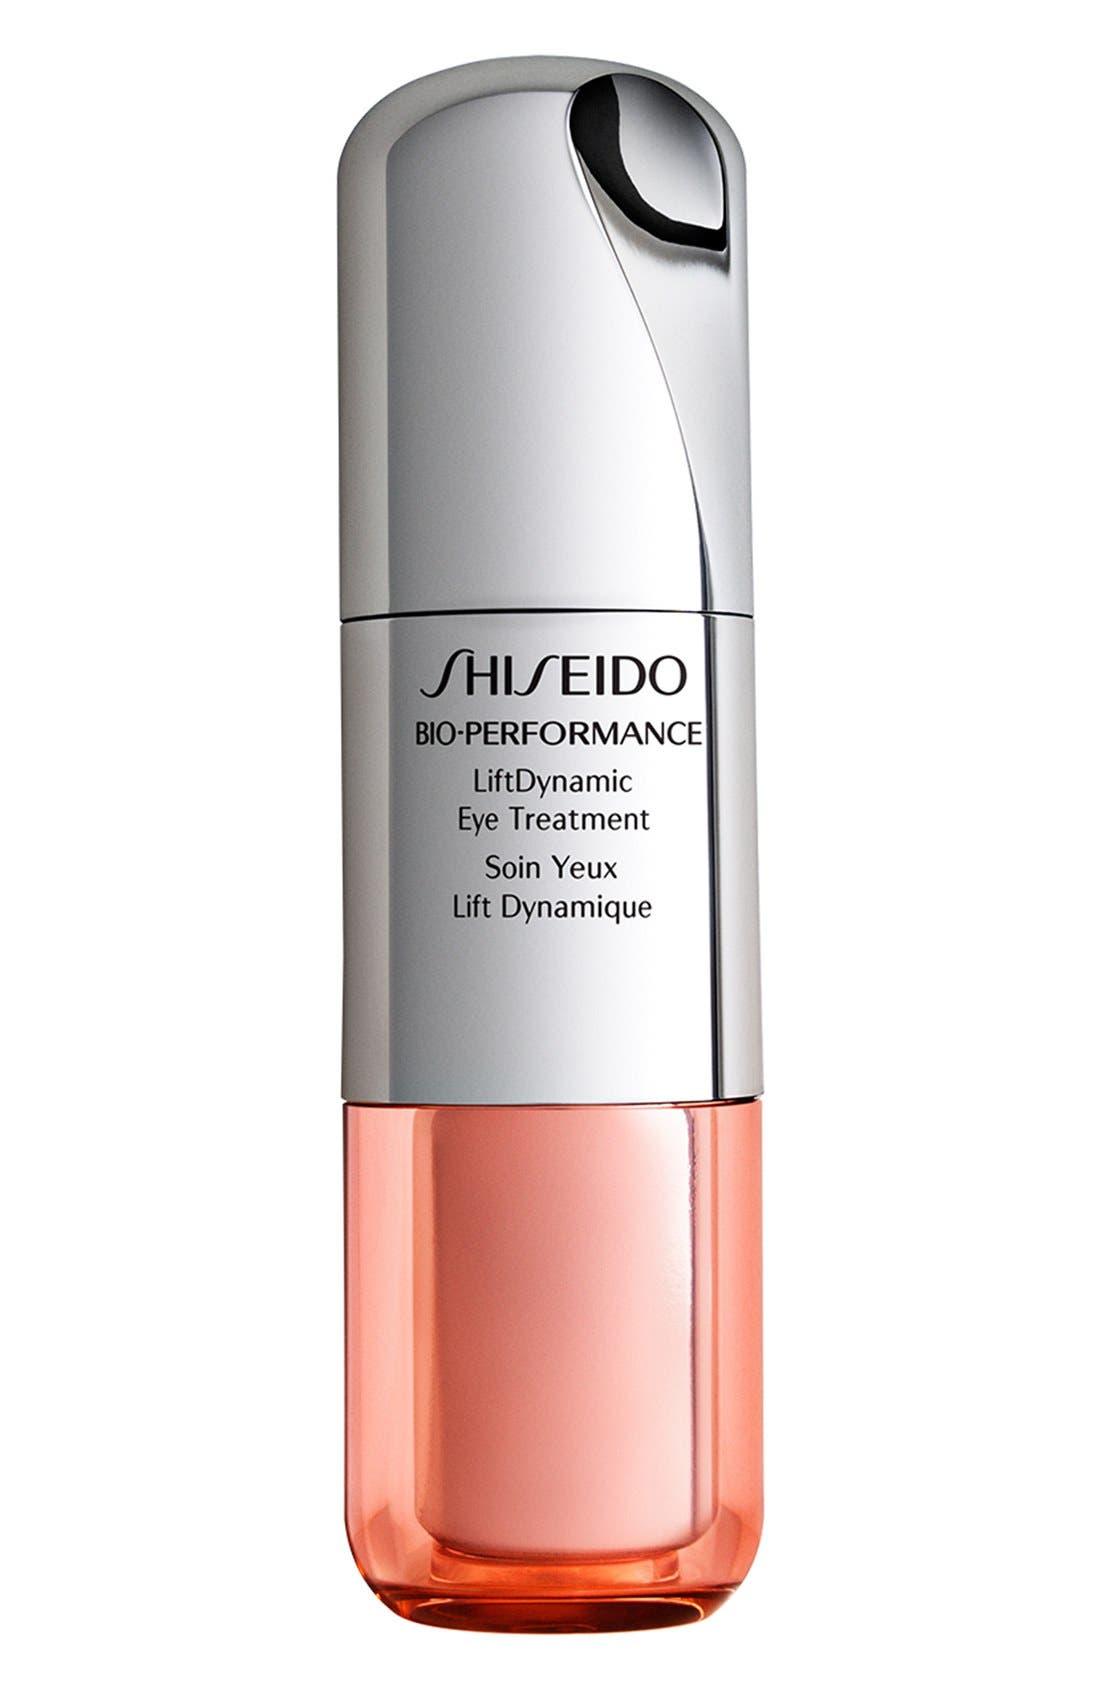 Shiseido 'Bio-Performance' LiftDynamic Eye Treatment